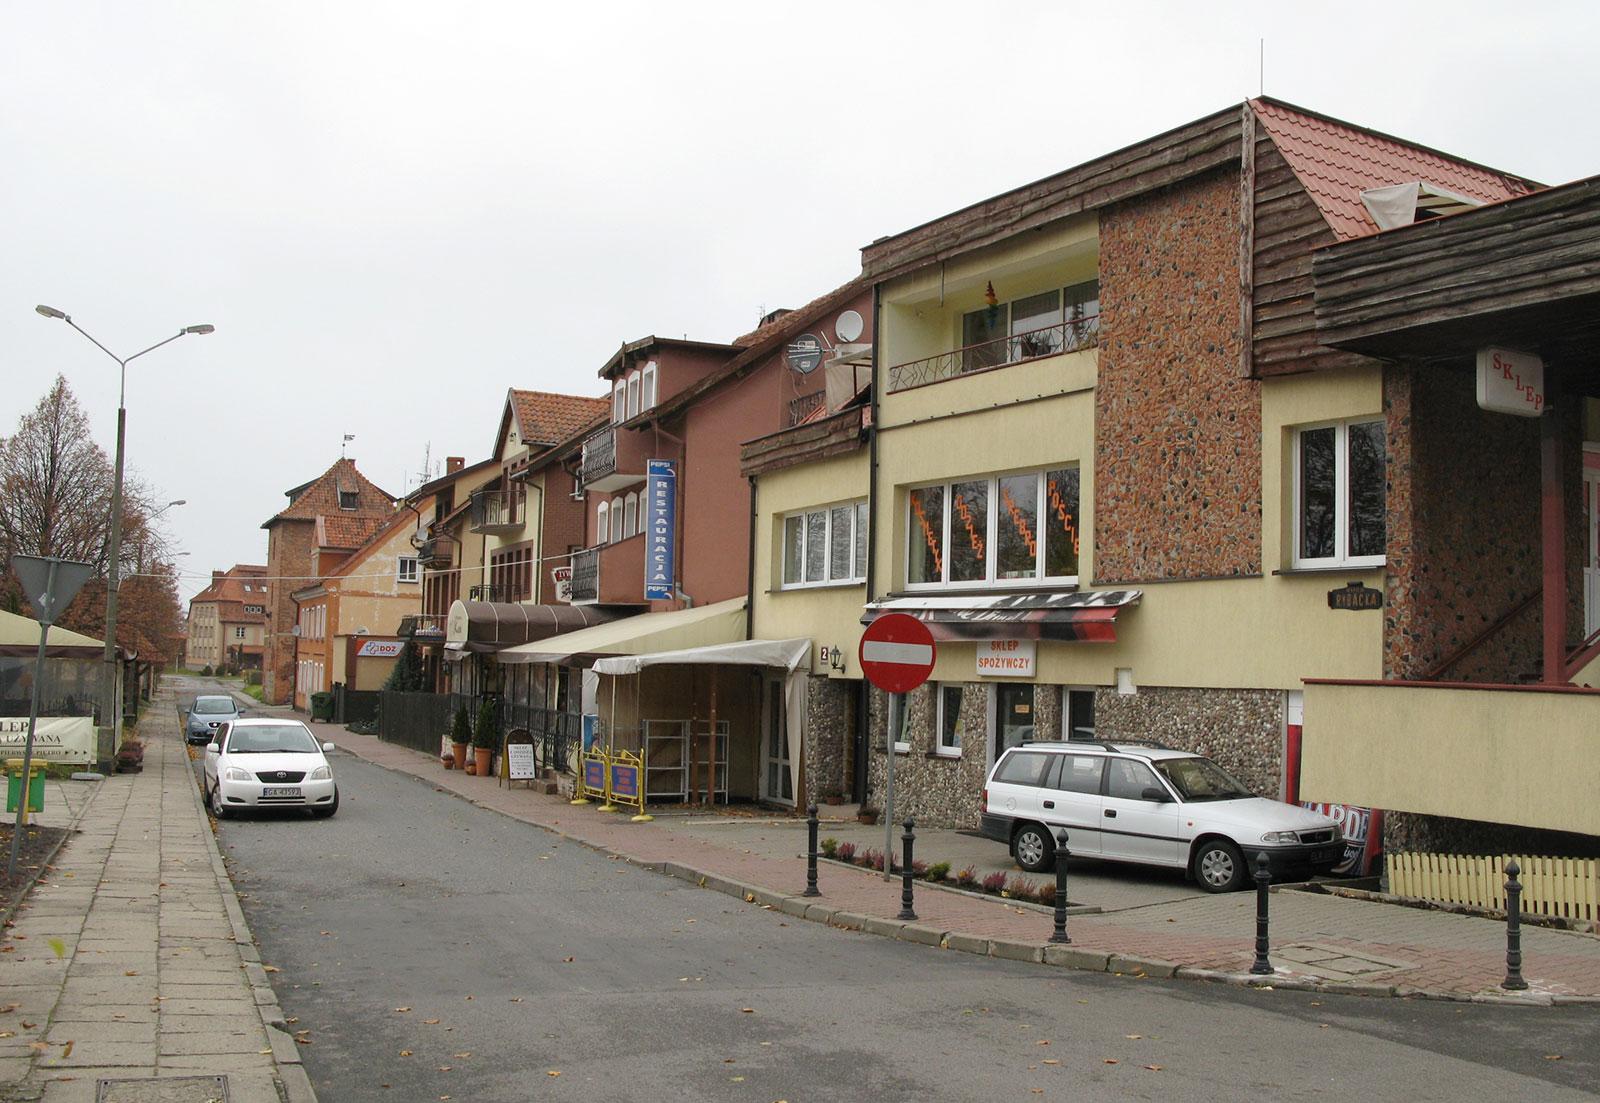 улица Фромборка, Польша